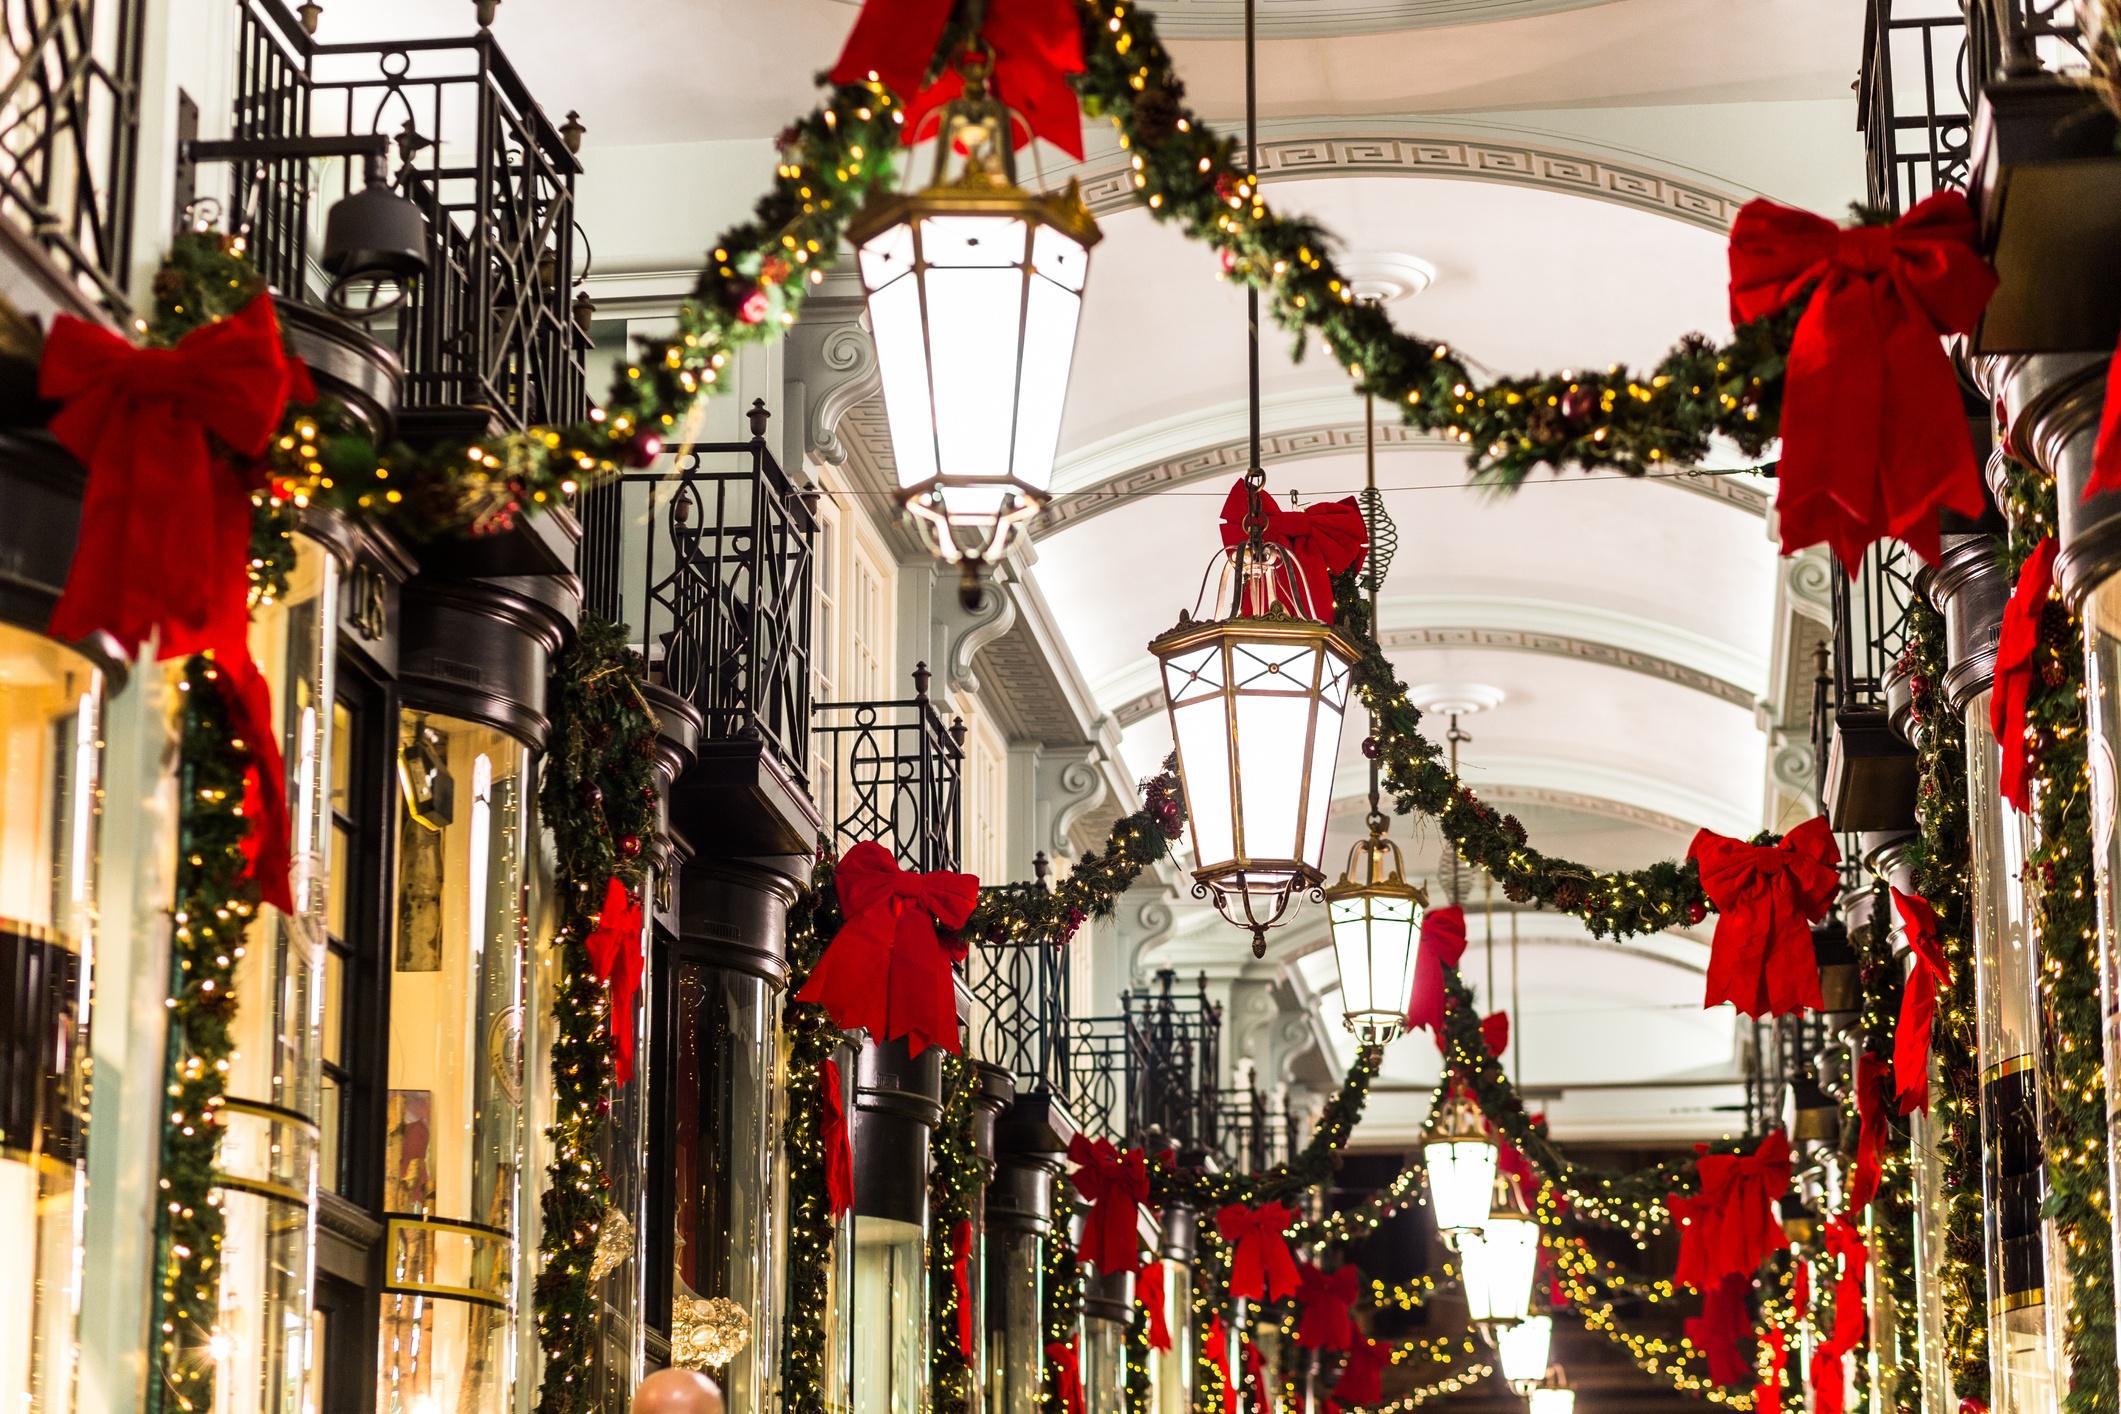 iStock-524925837_London Christmas Shopping Arcade.jpg